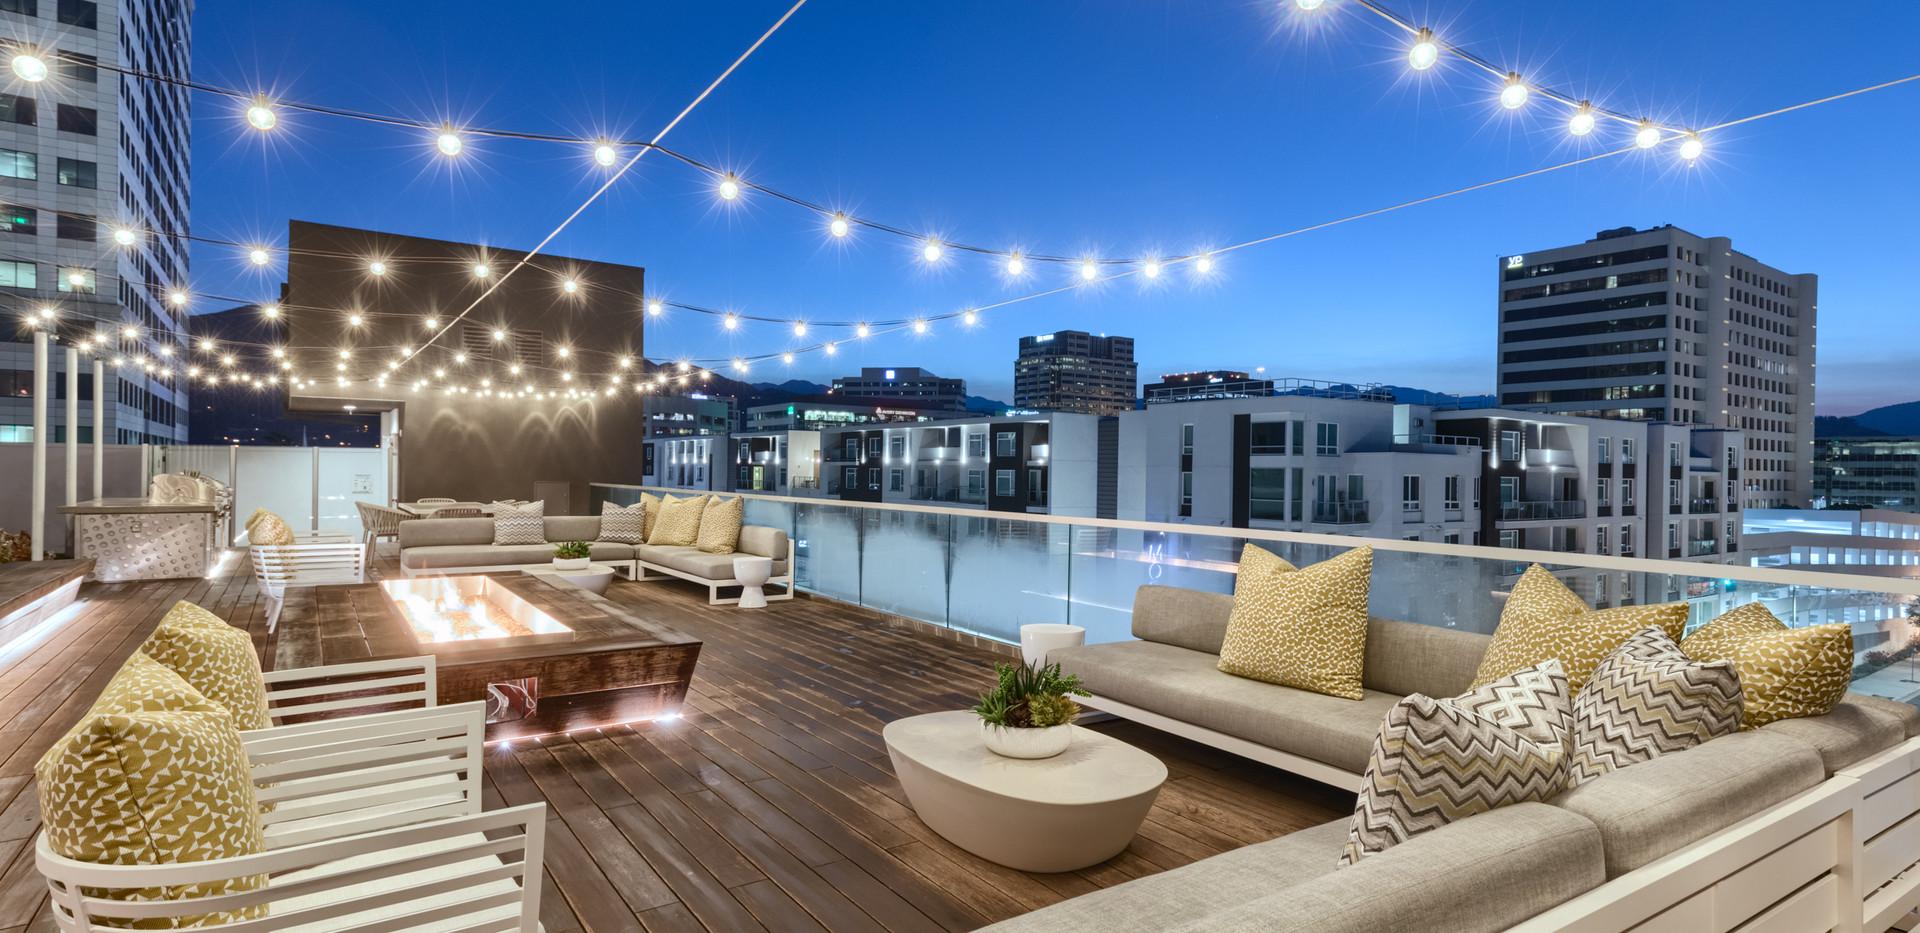 Roof Deck Pool Lounge